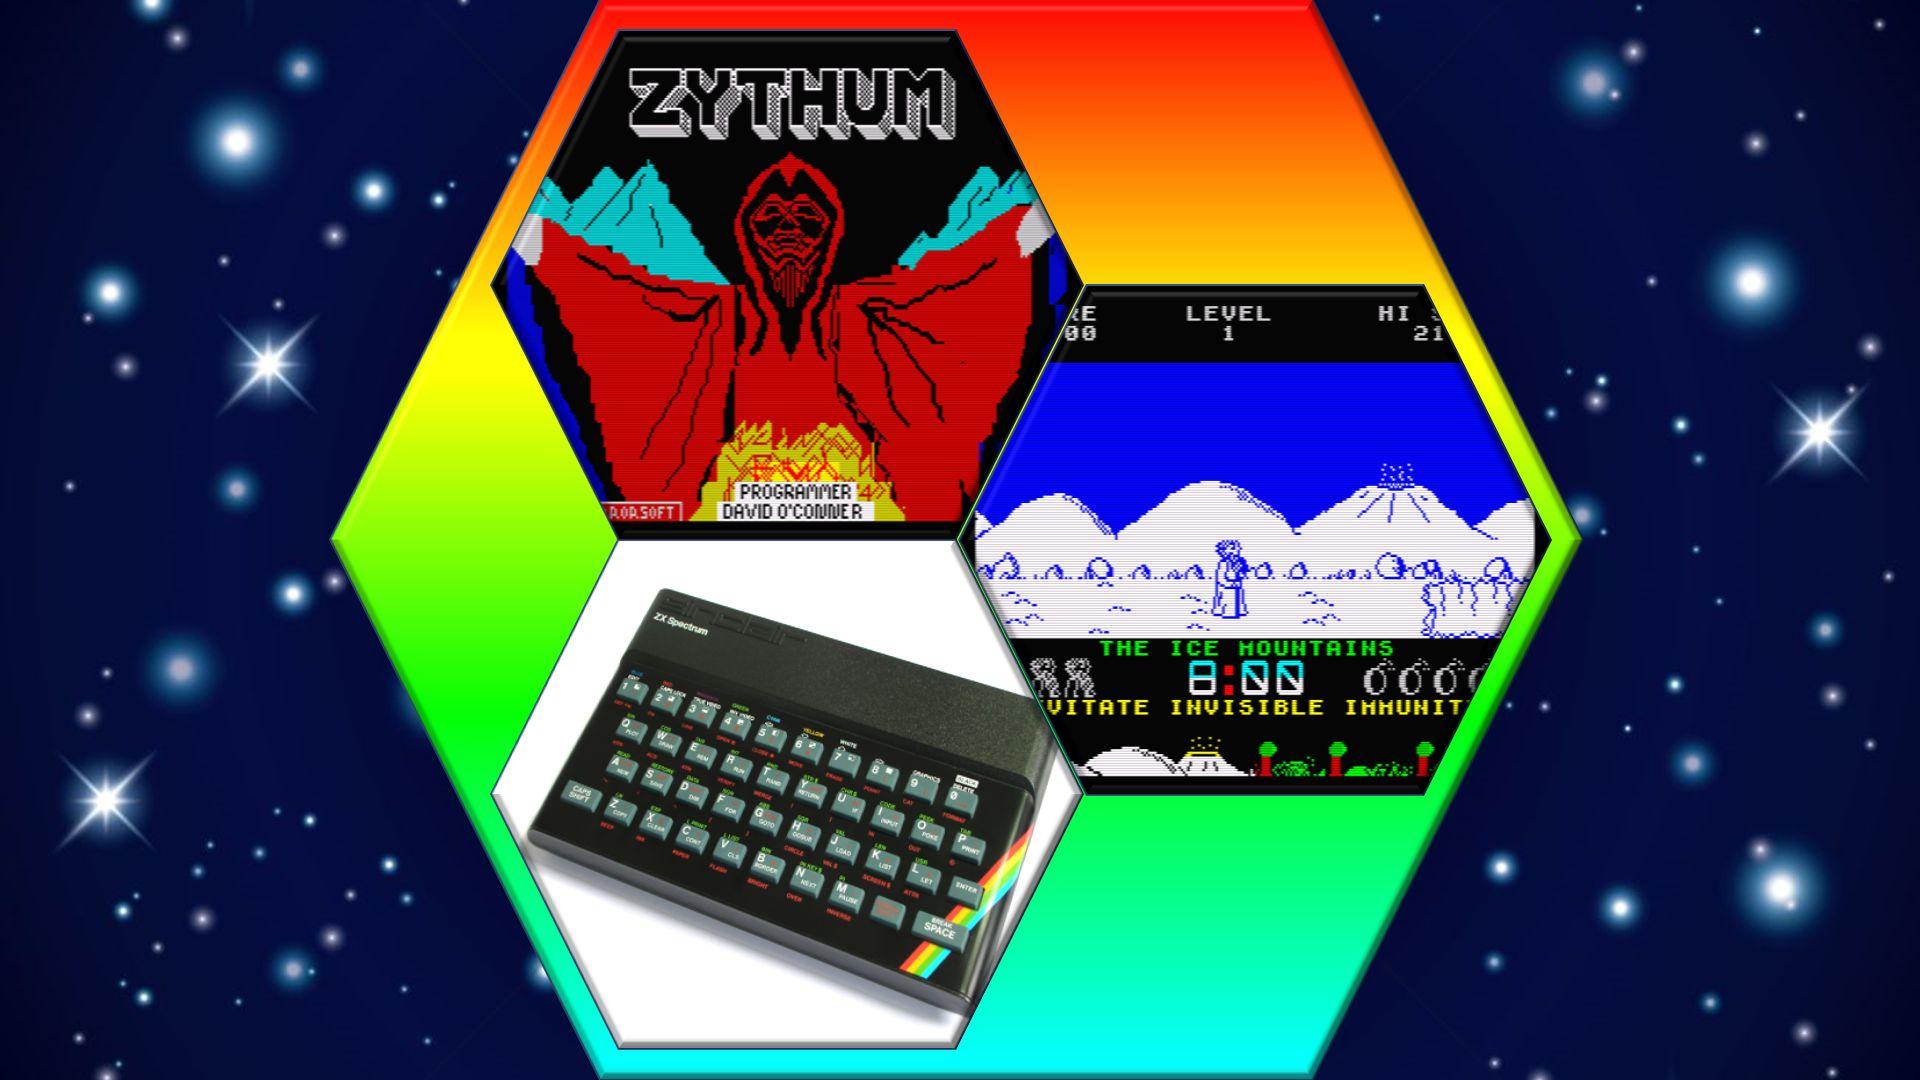 /zythum-zx-spectrum-retro-game-review-122r34ea feature image